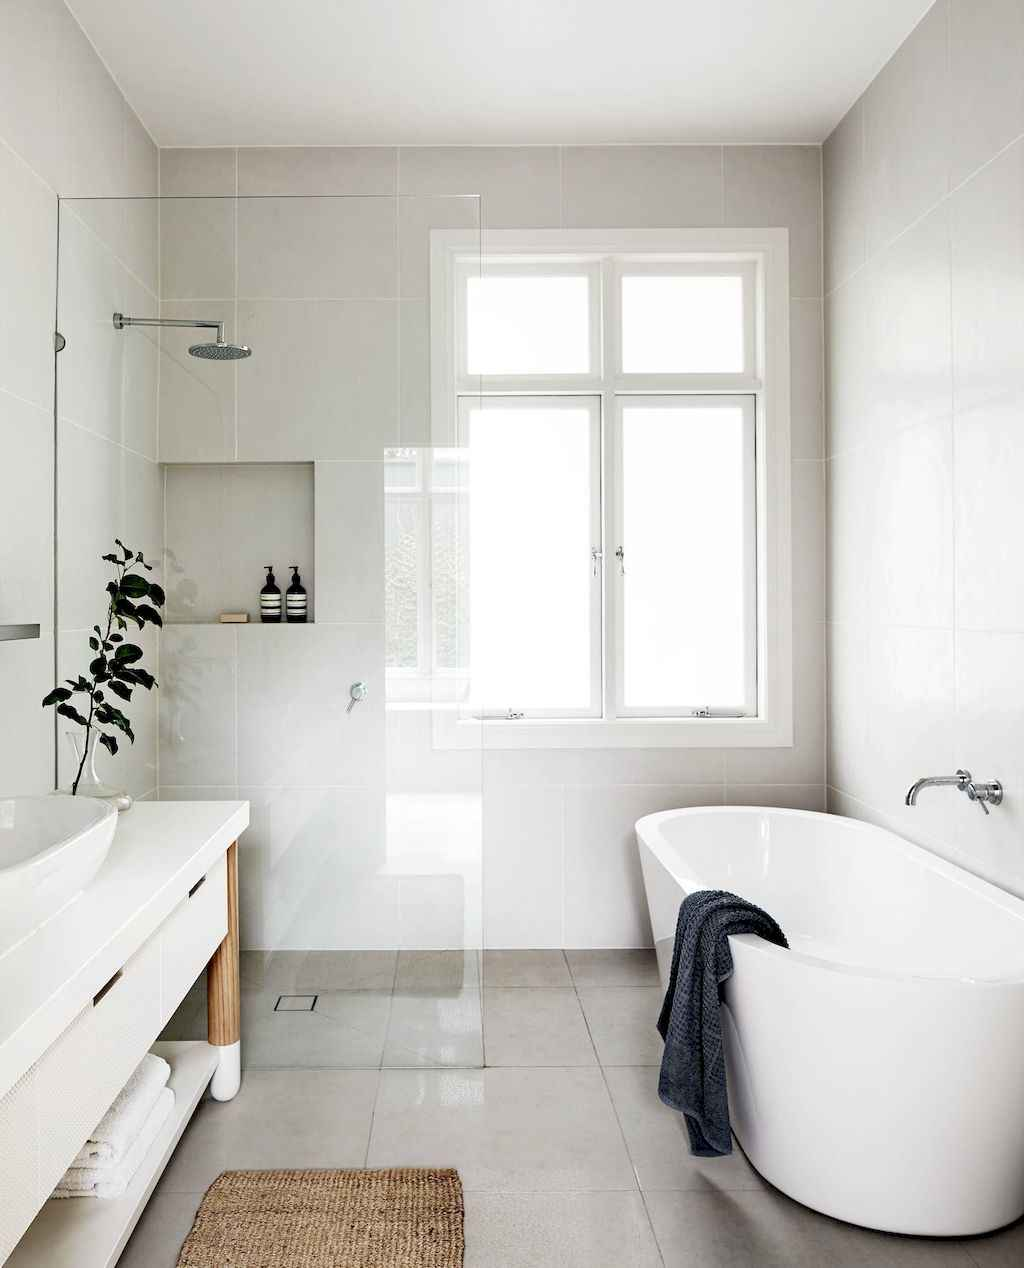 111 Brilliant Small Bathroom Remodel Ideas On A Budget (83)